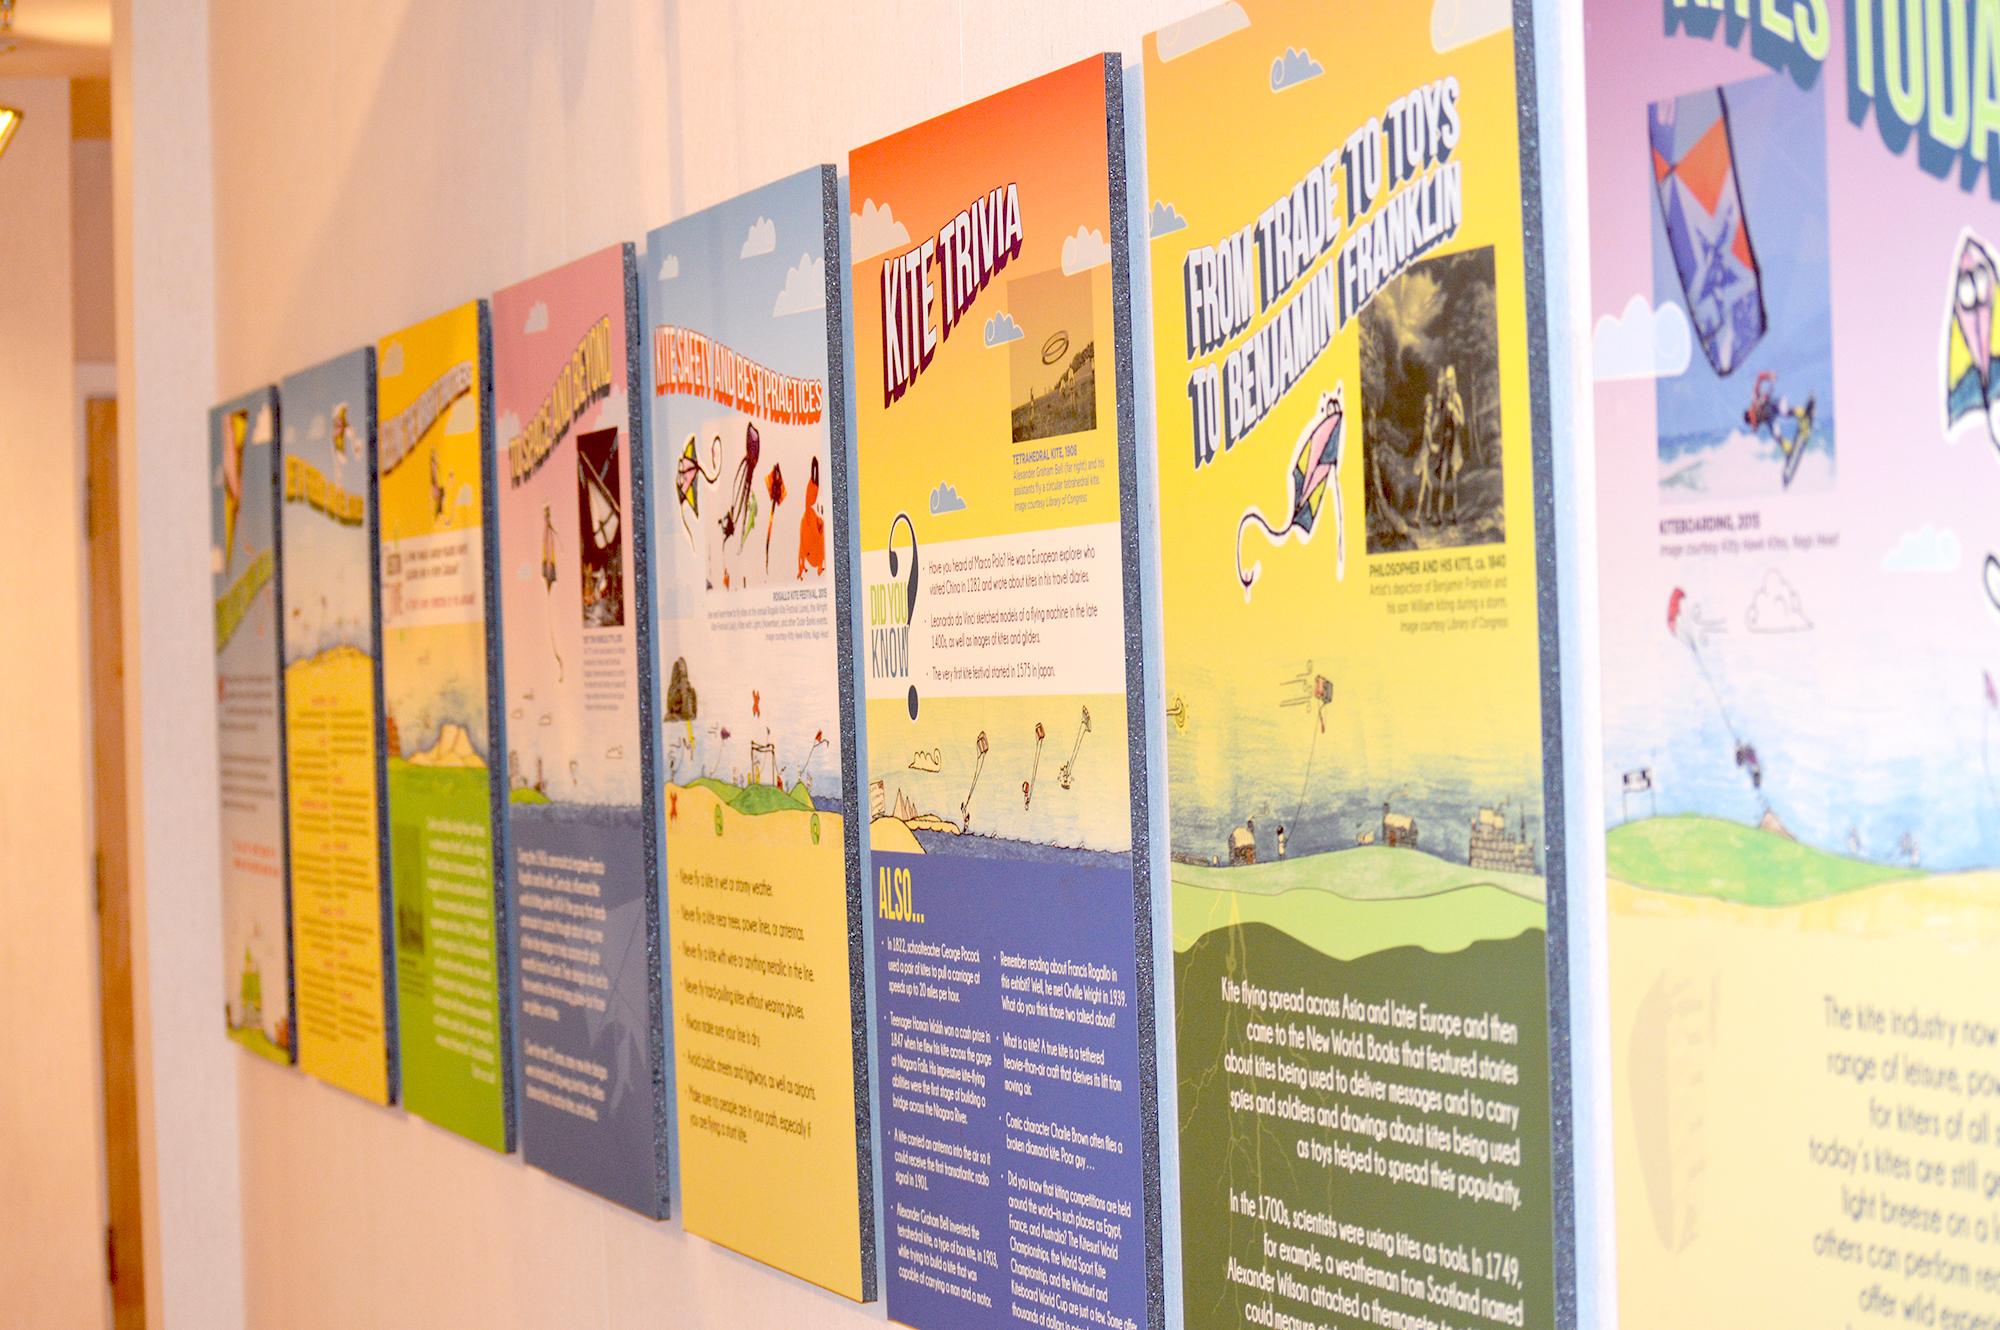 2018 traveling summer exhibits at Roanoke Island Festival Park